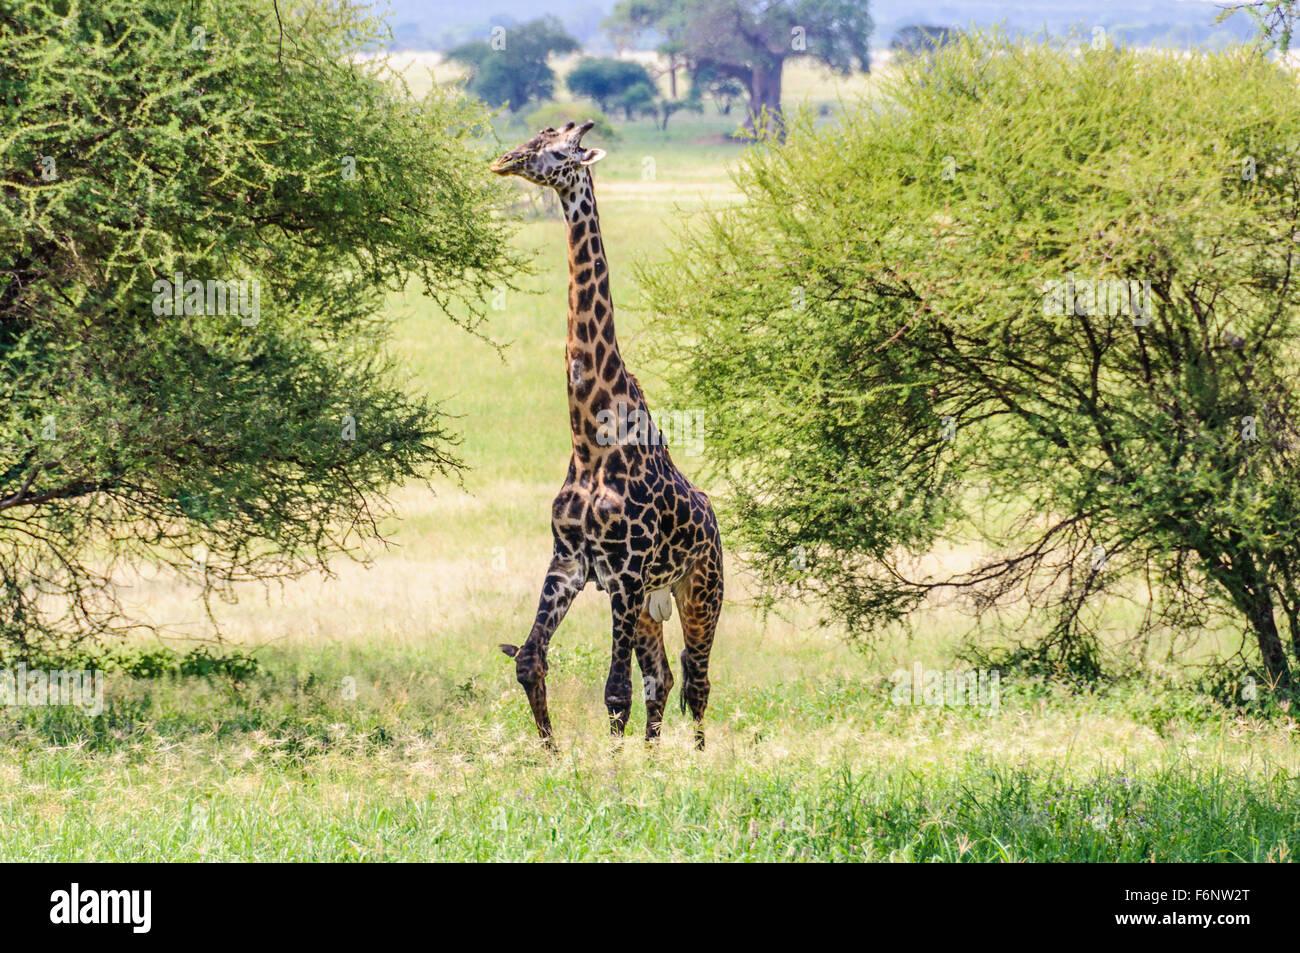 Eating giraffe in the Tarangire National Park, Tanzania - Stock Image